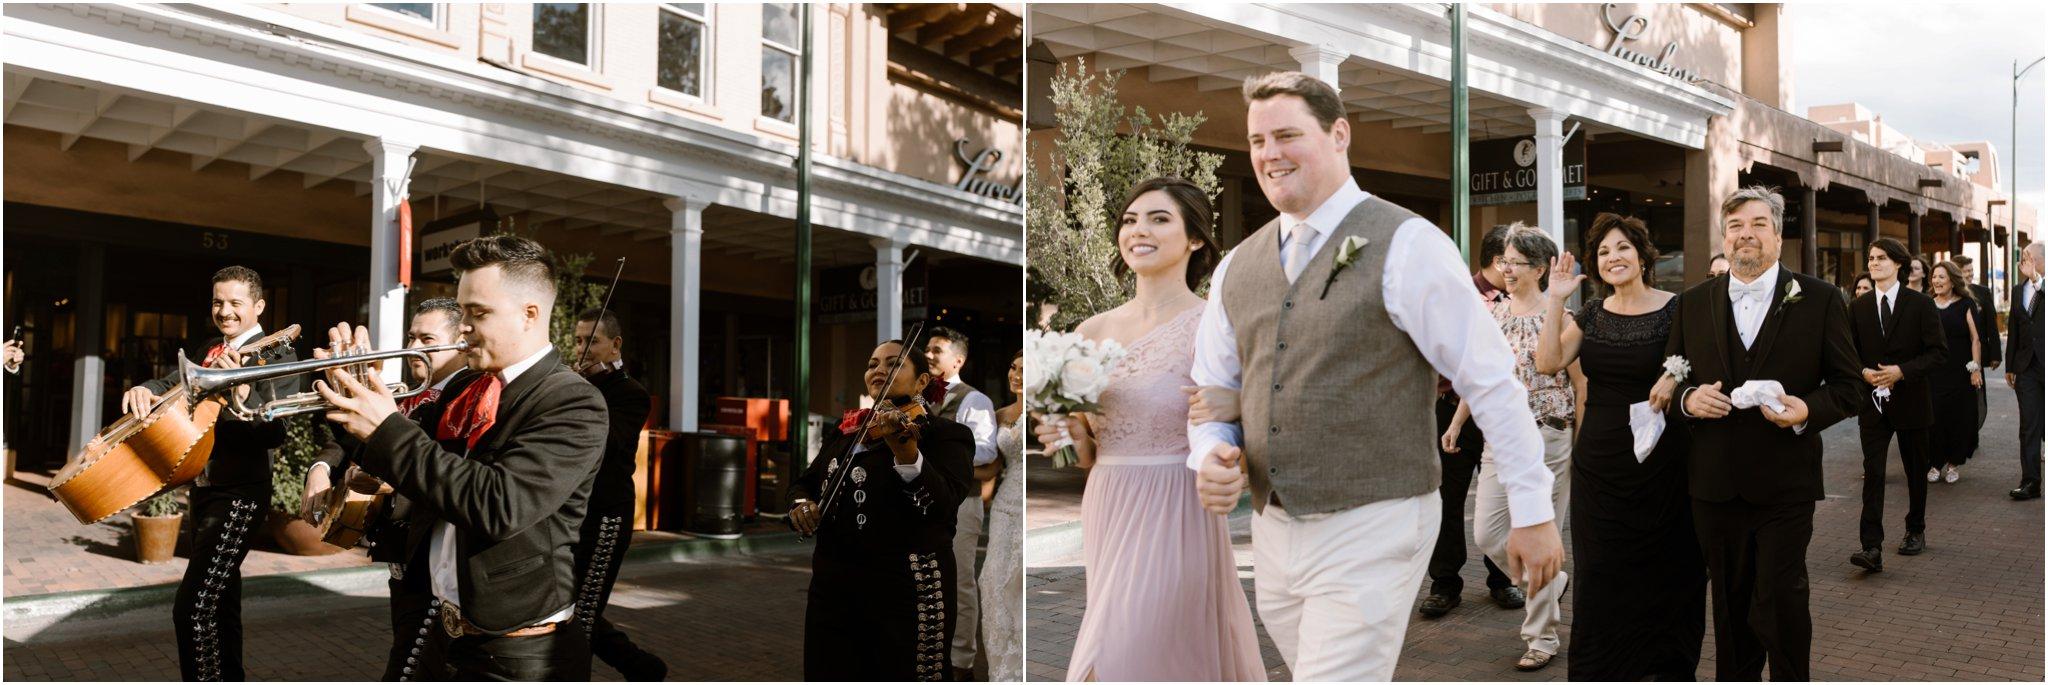 0038La Fonda Weddings Blue Rose Photography Studios